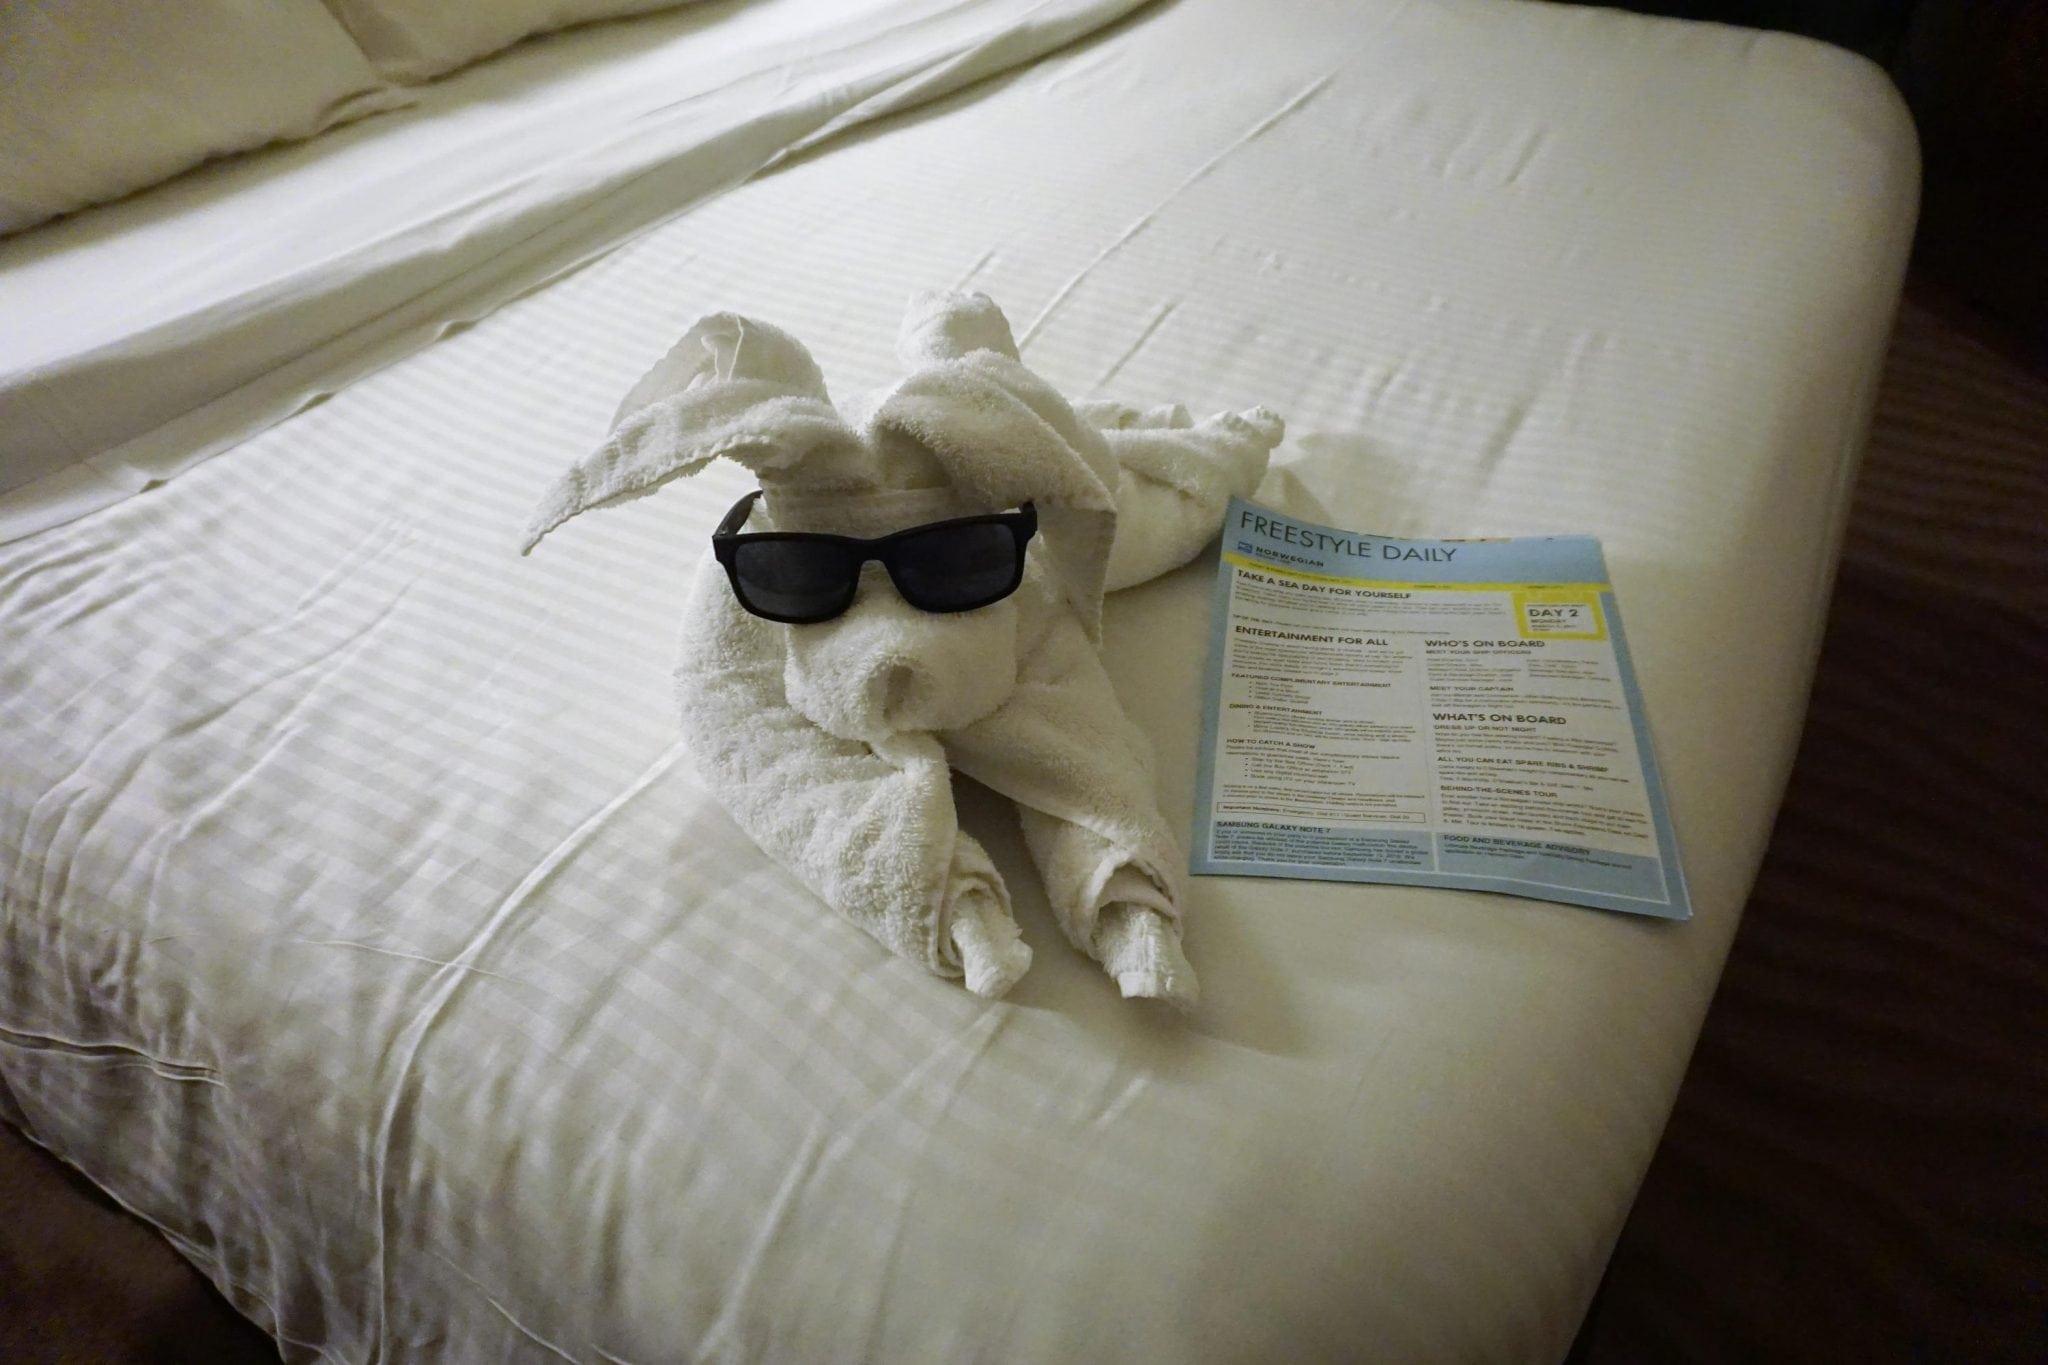 Norwegian Getaway Cruise Review